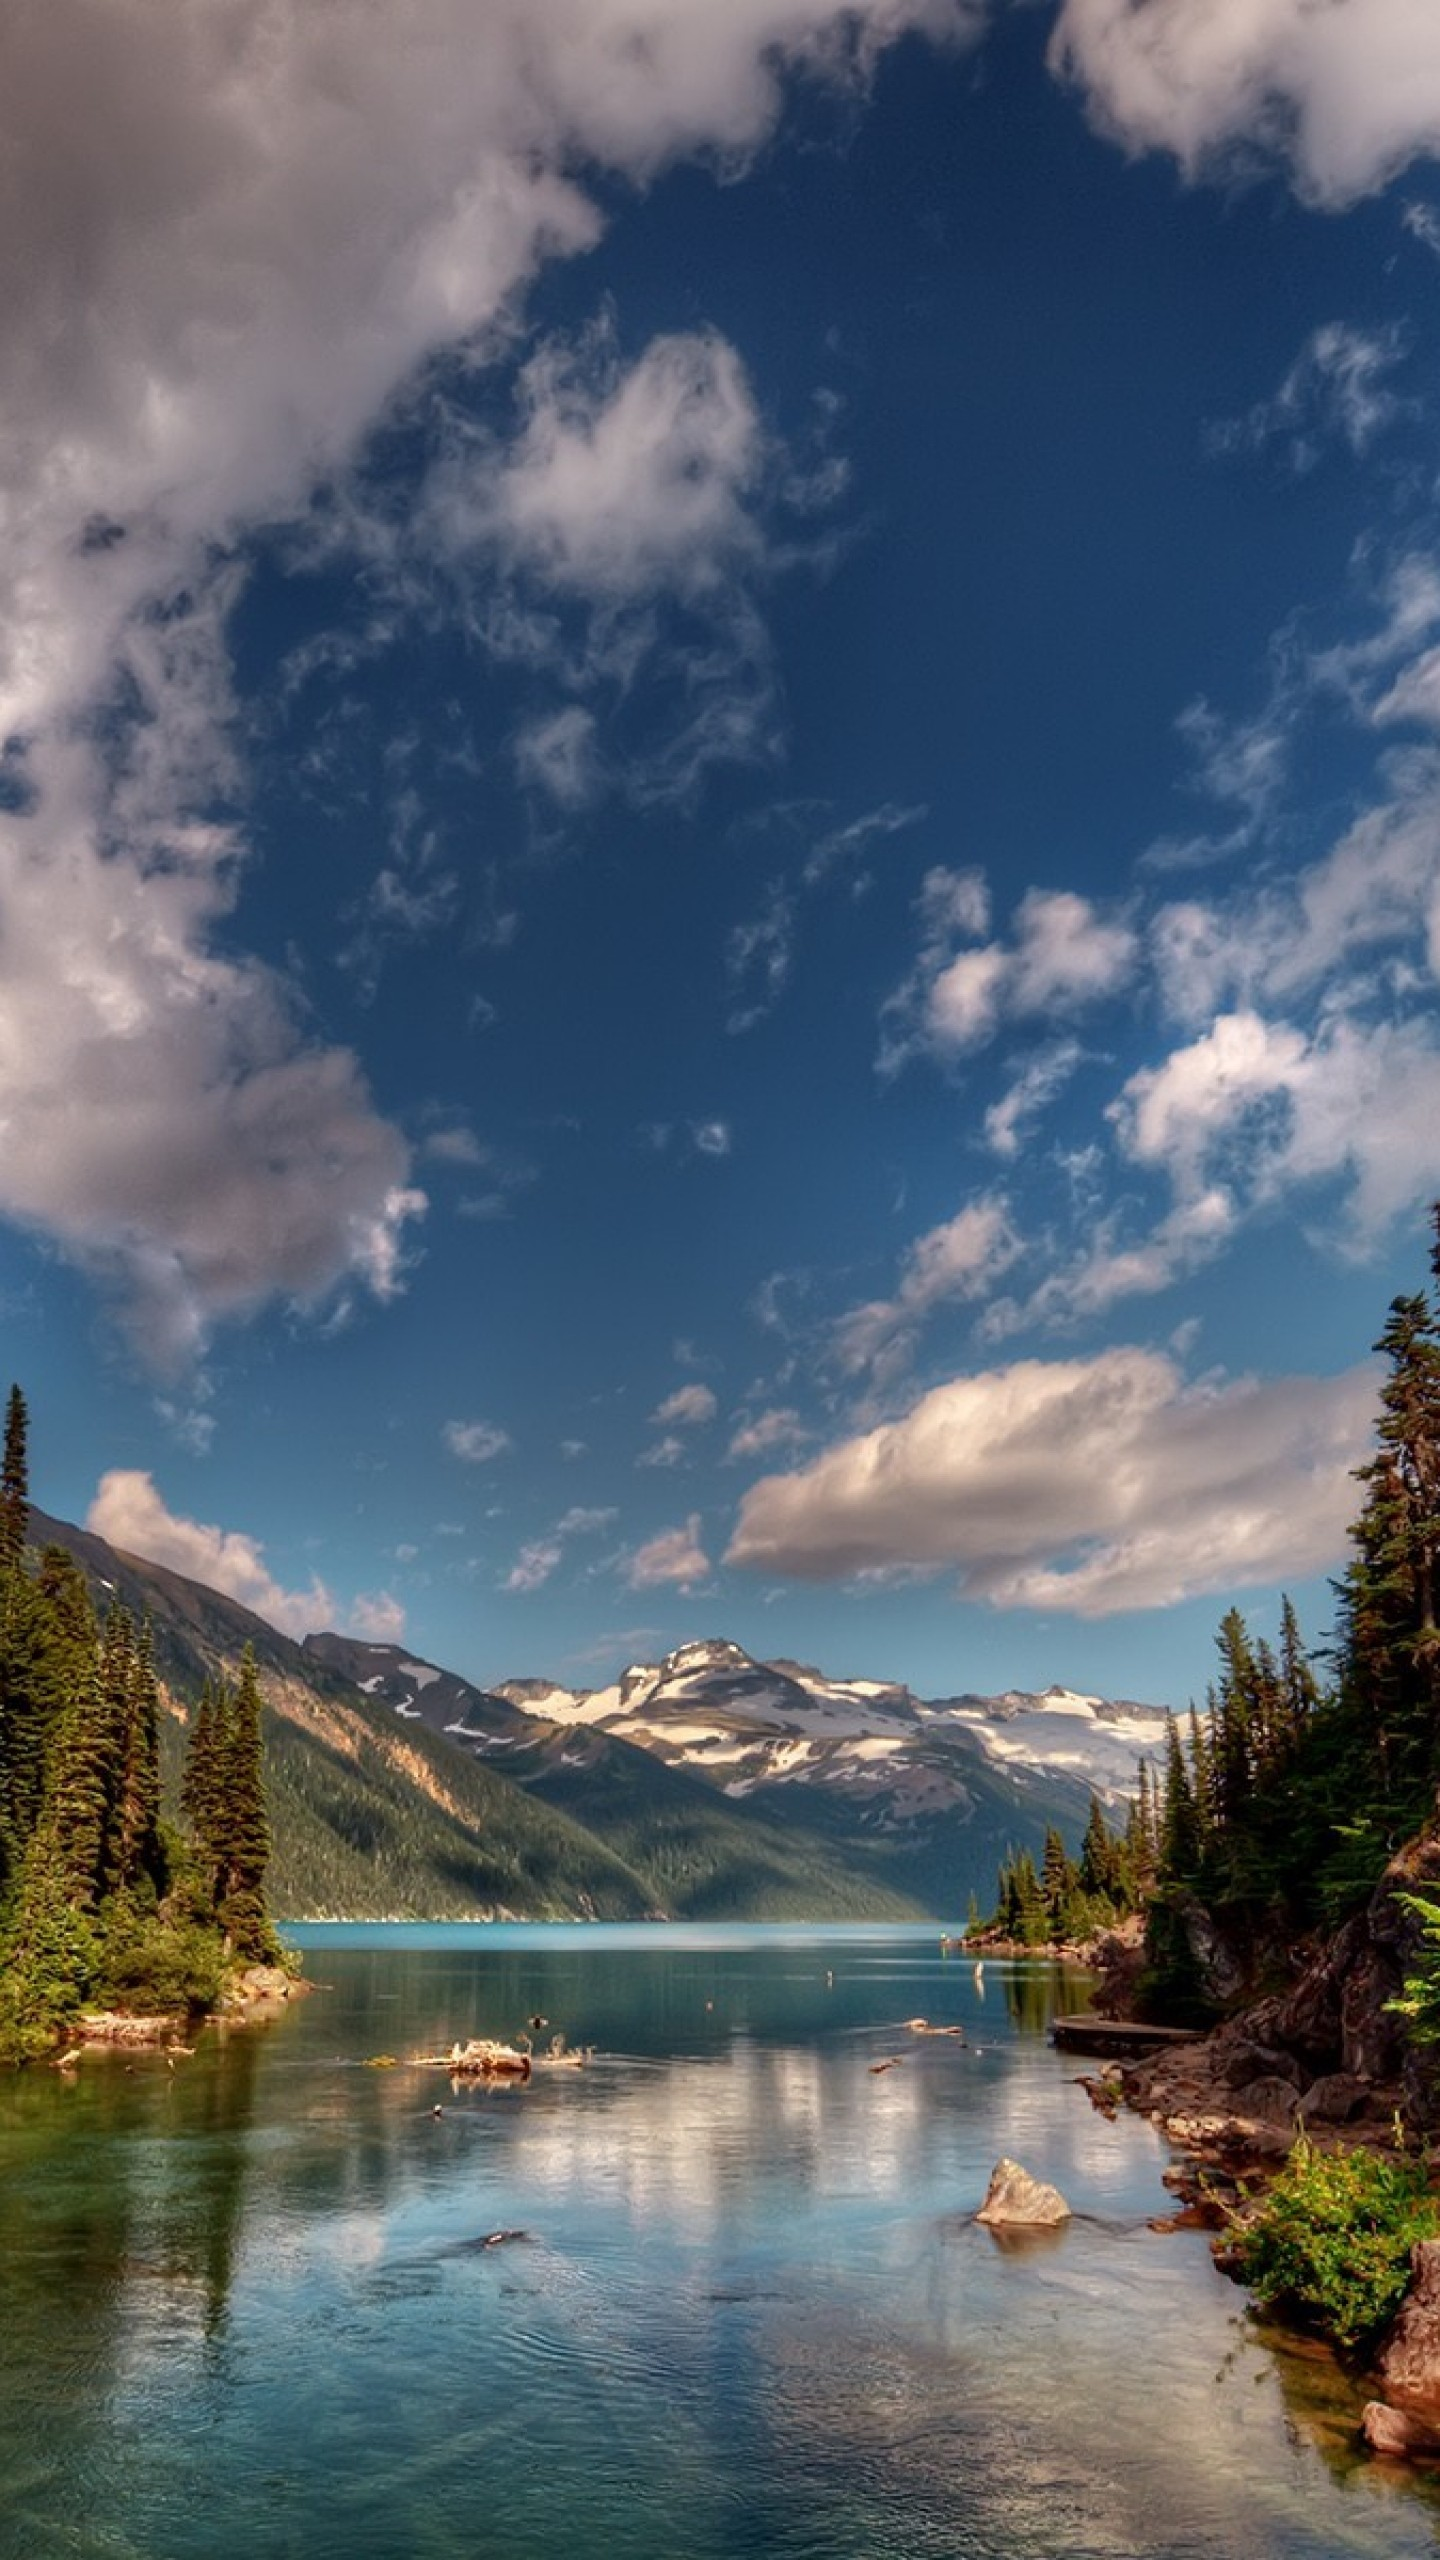 Wallpaper mountains, nature, sky, river, beautiful scenery